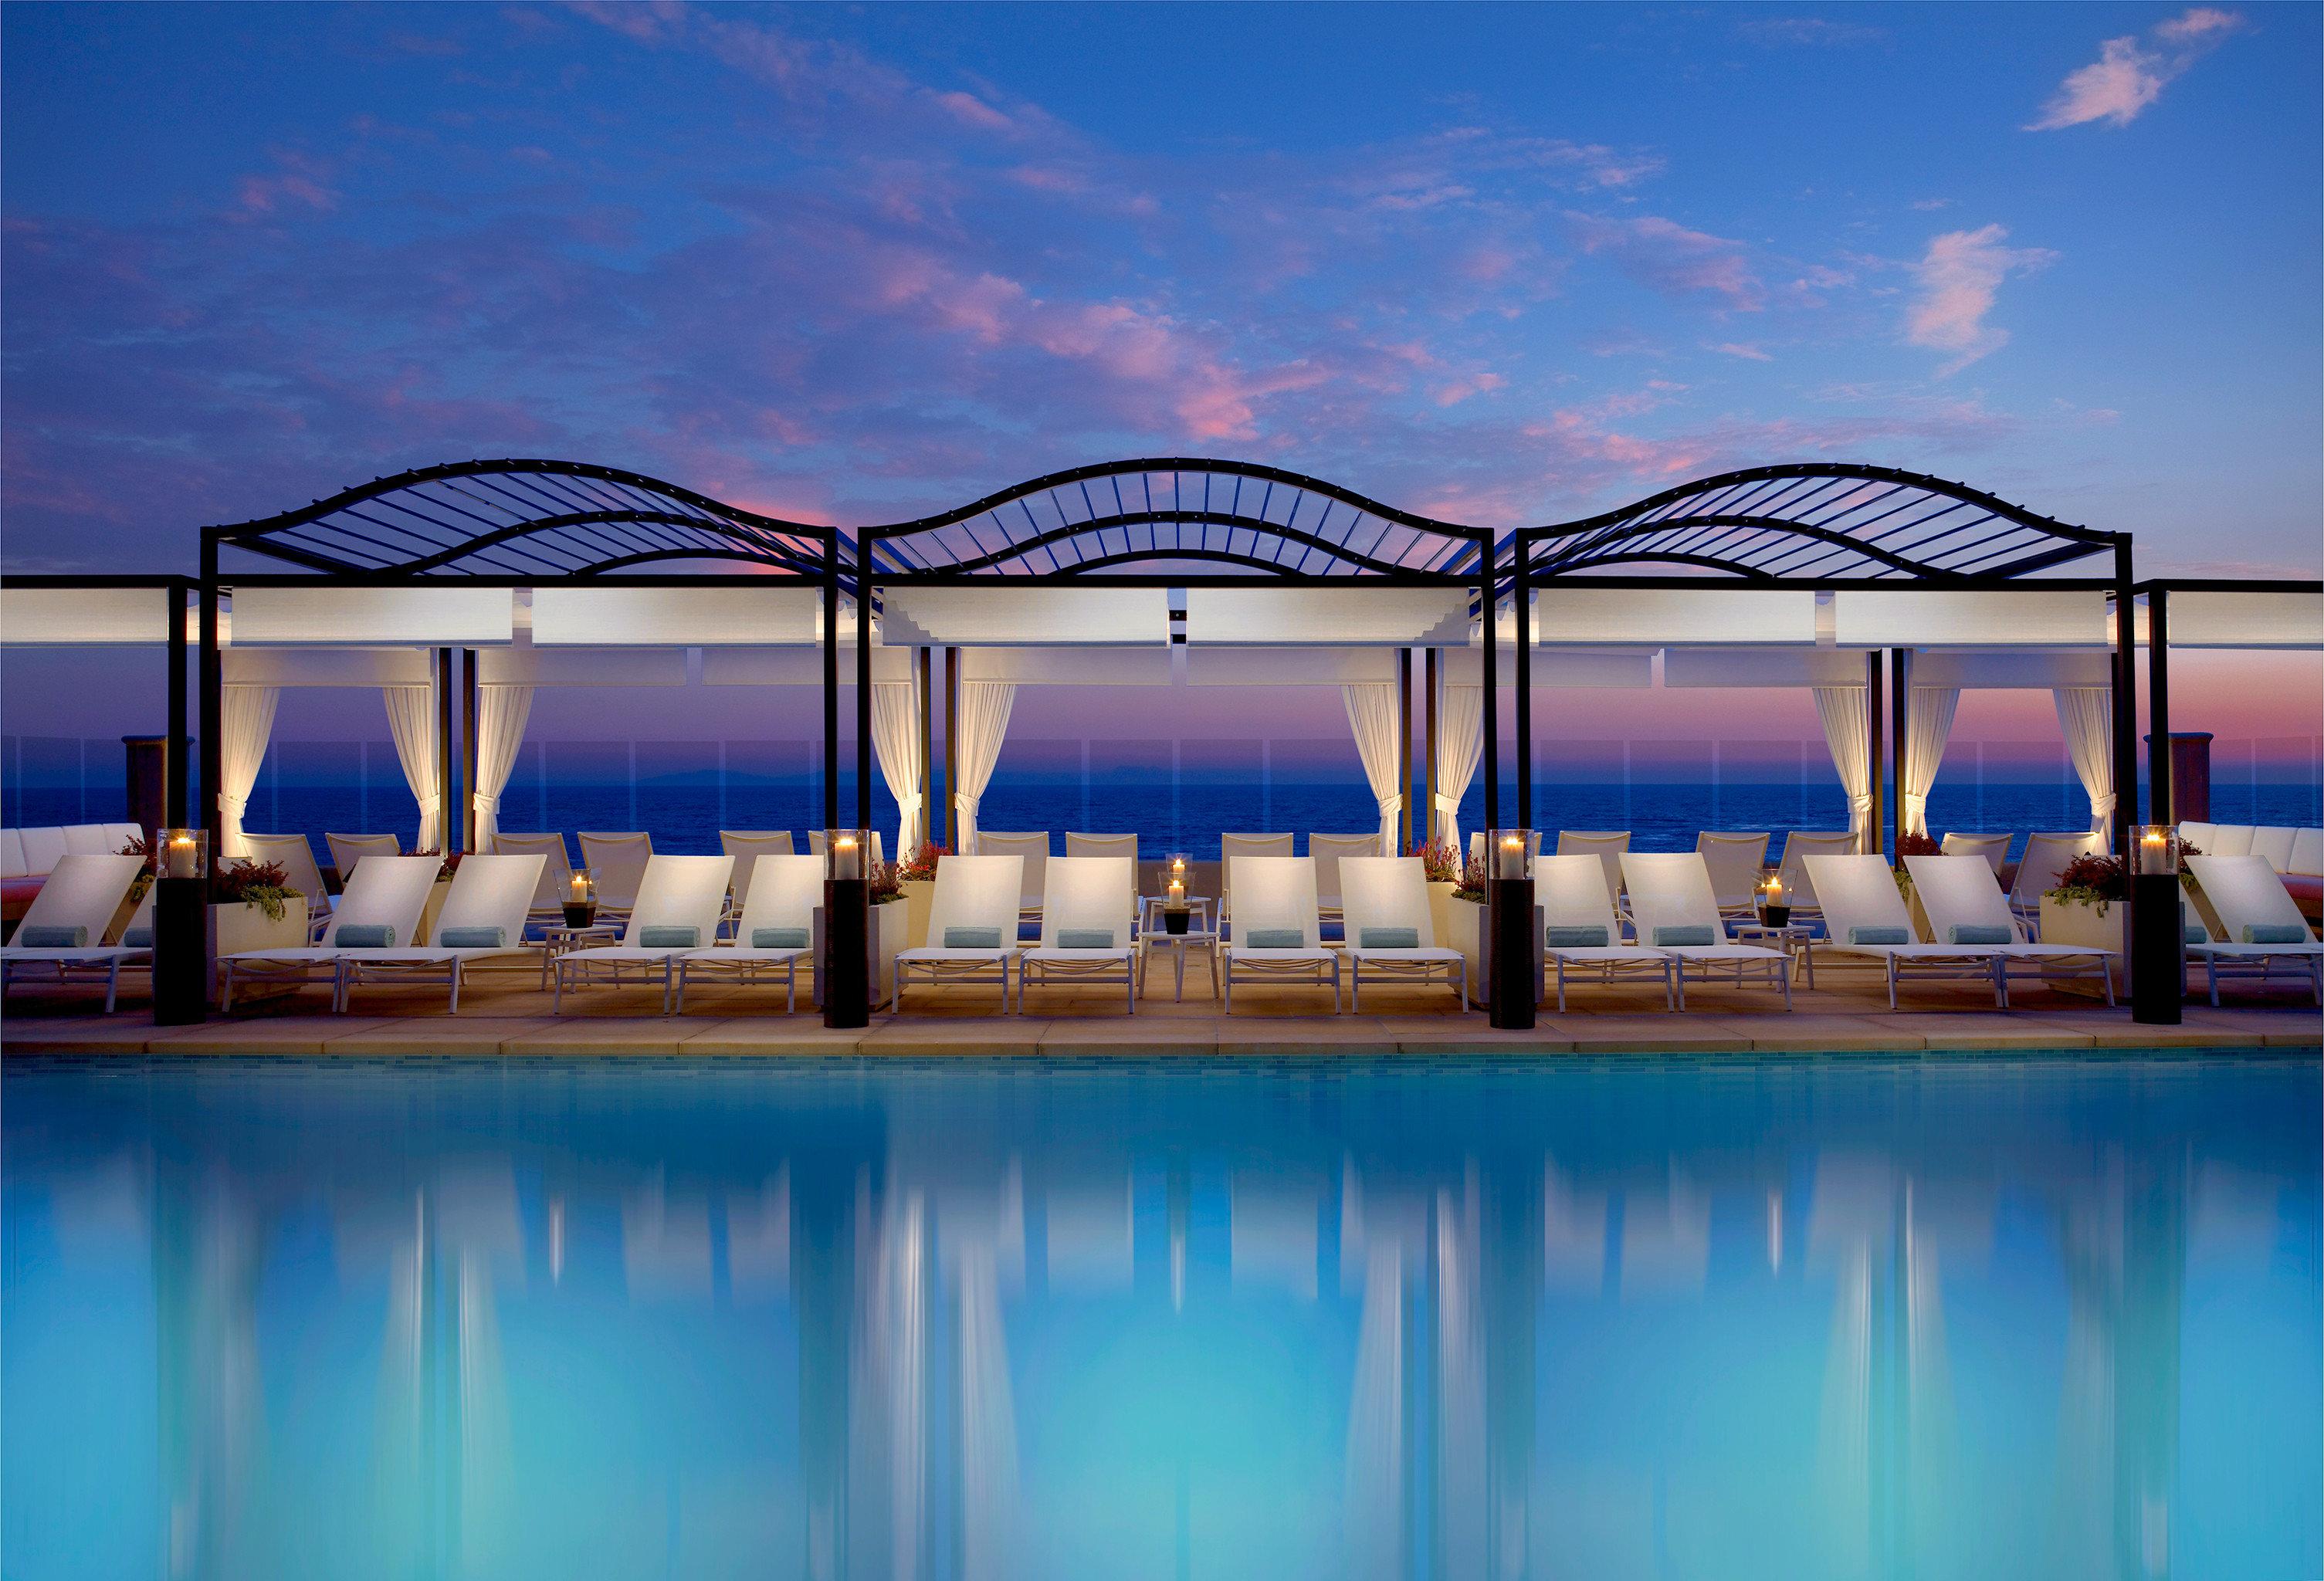 Elegant Modern sky water leisure swimming pool blue scene Resort marina dock evening colorful colored